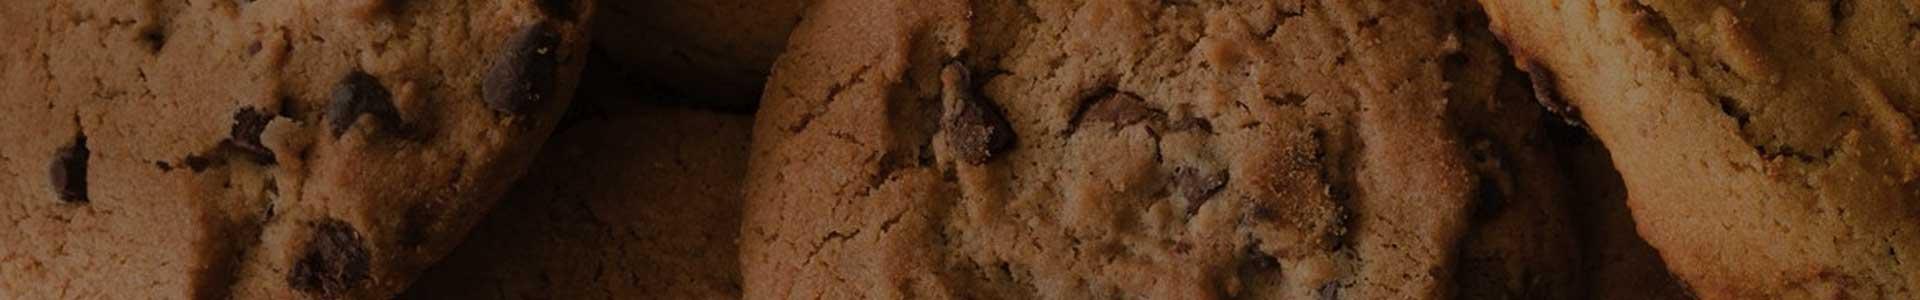 Photo of delicious cookies